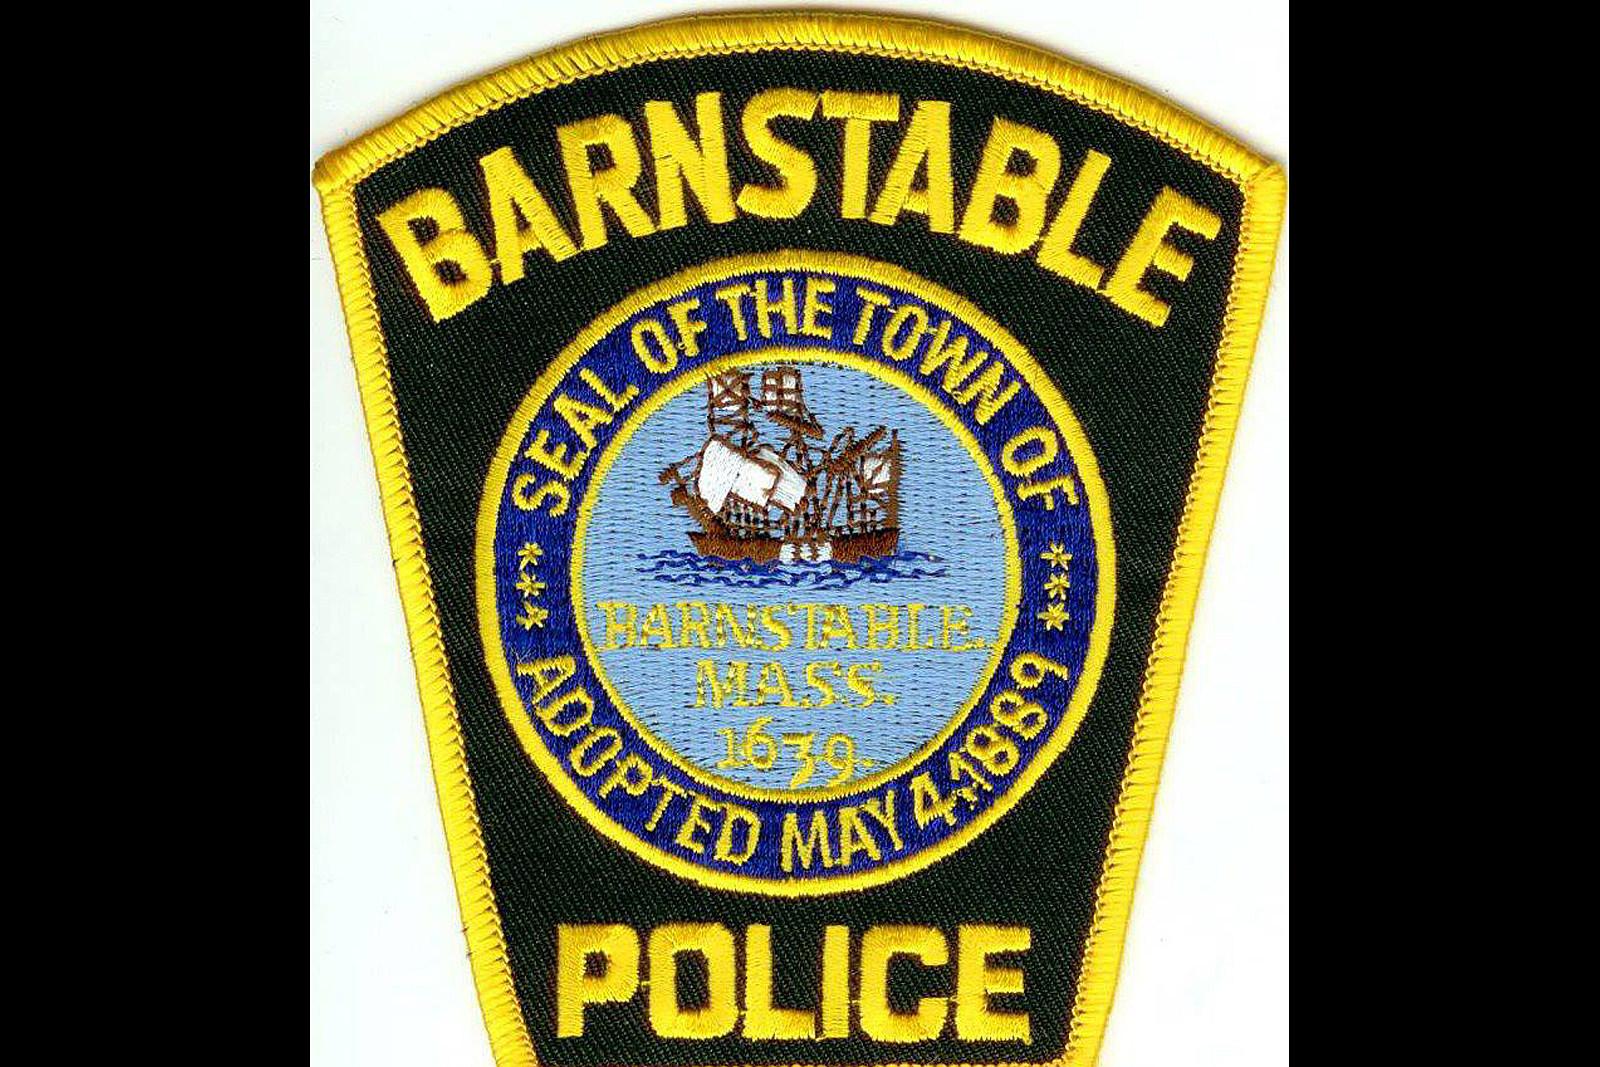 Barnstable Police Departmet/Facebook